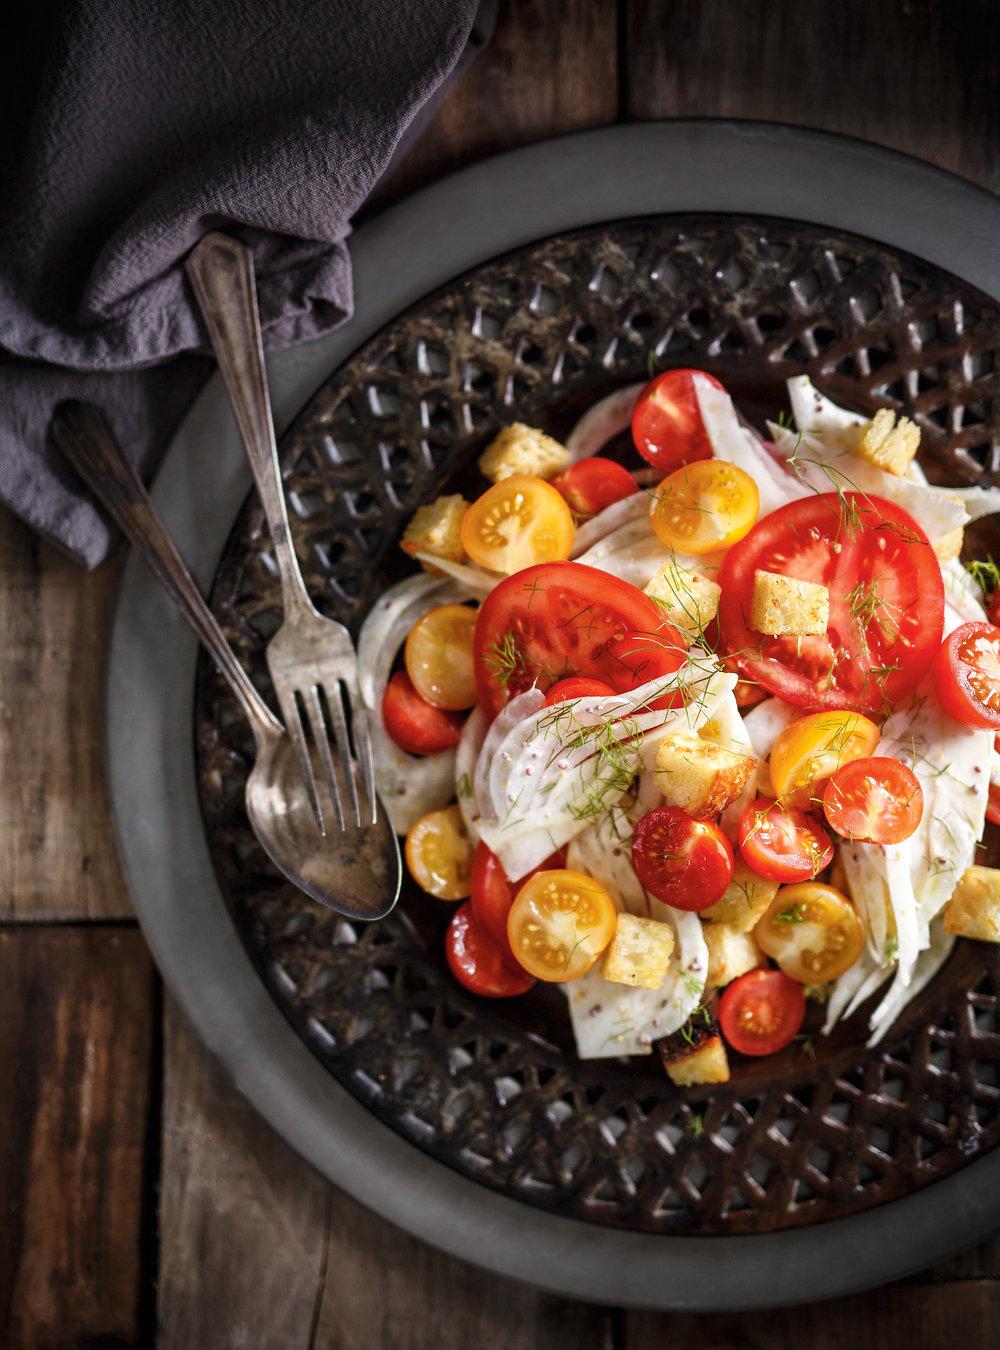 Salade de tomate, de fenouil et de croûtons | ricardo